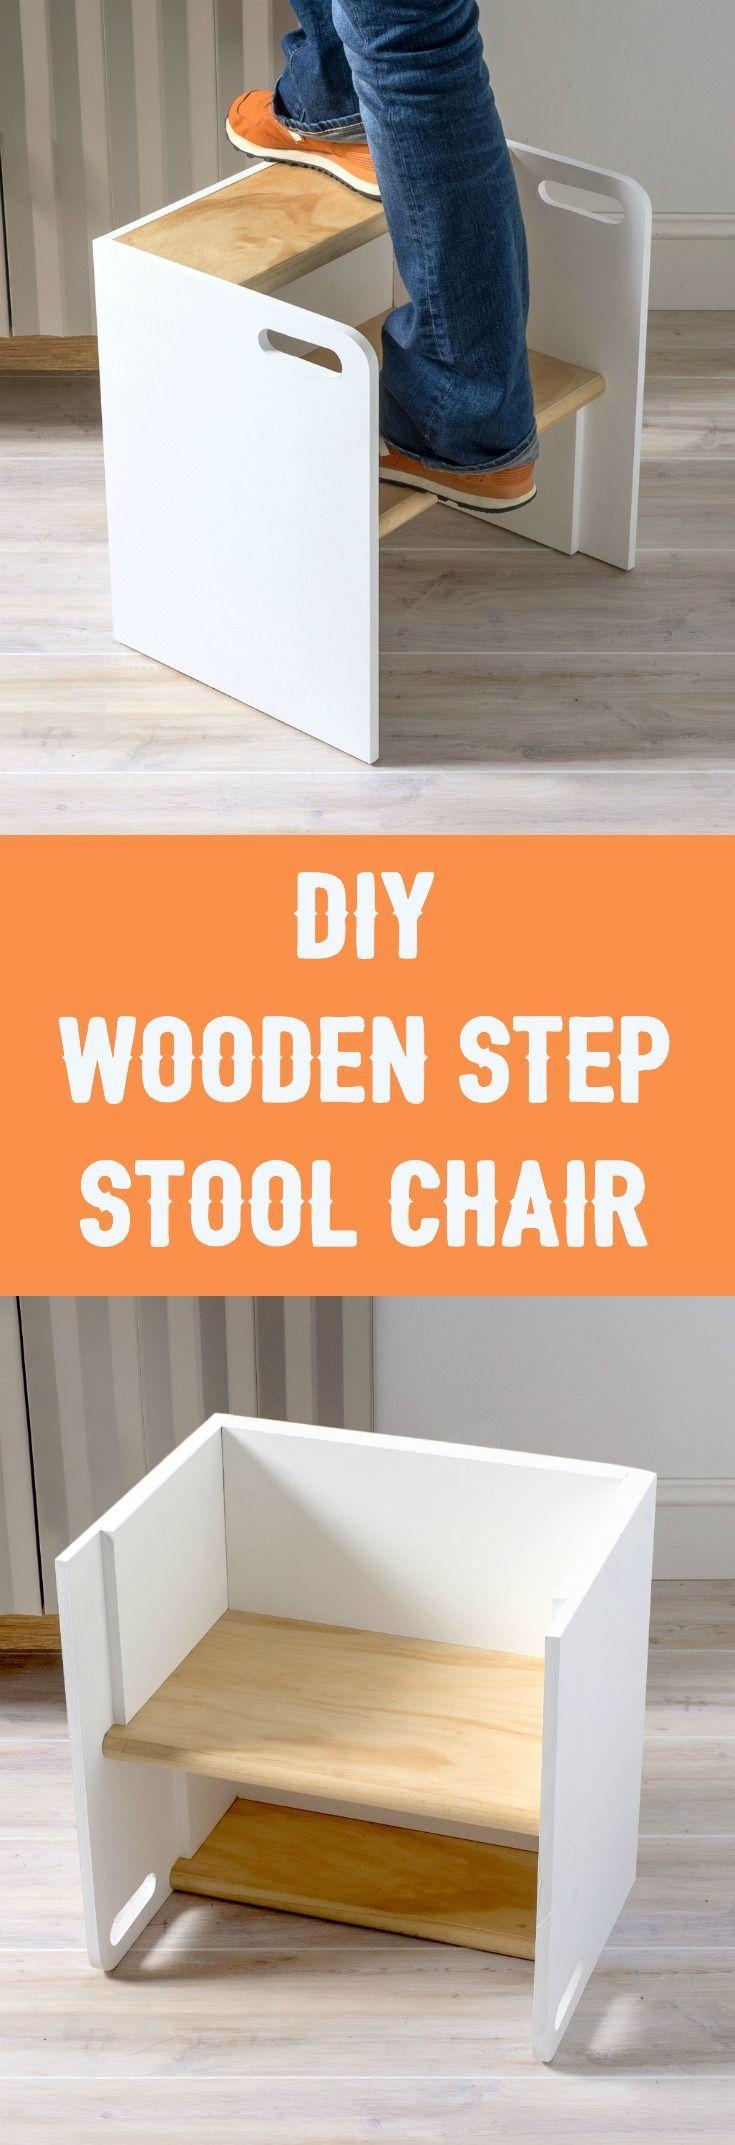 Wooden dollhouse step foot stool wood footstool stepstool furniture - Diy Wooden Step Stool Chair